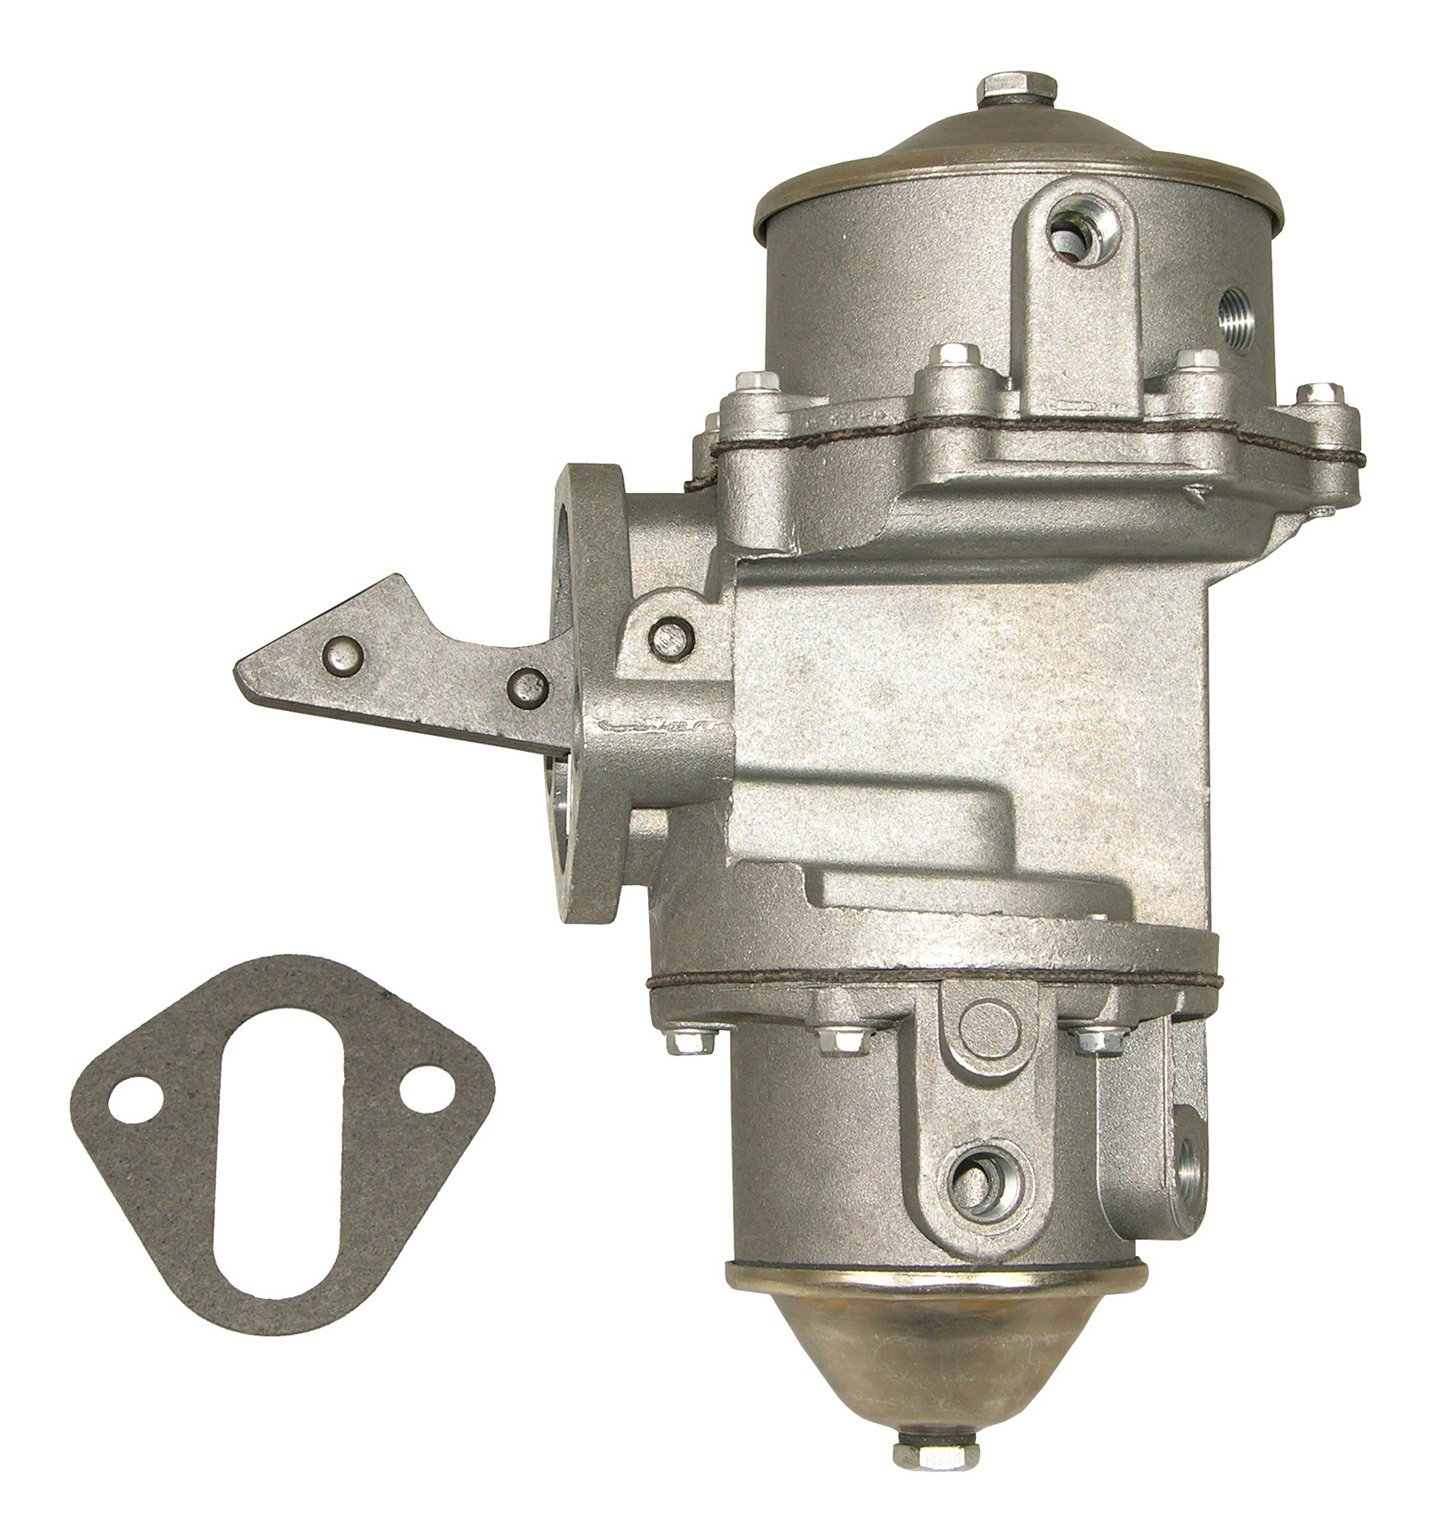 1962 Jeep Dispatcher Mechanical Fuel Pump Af 9562